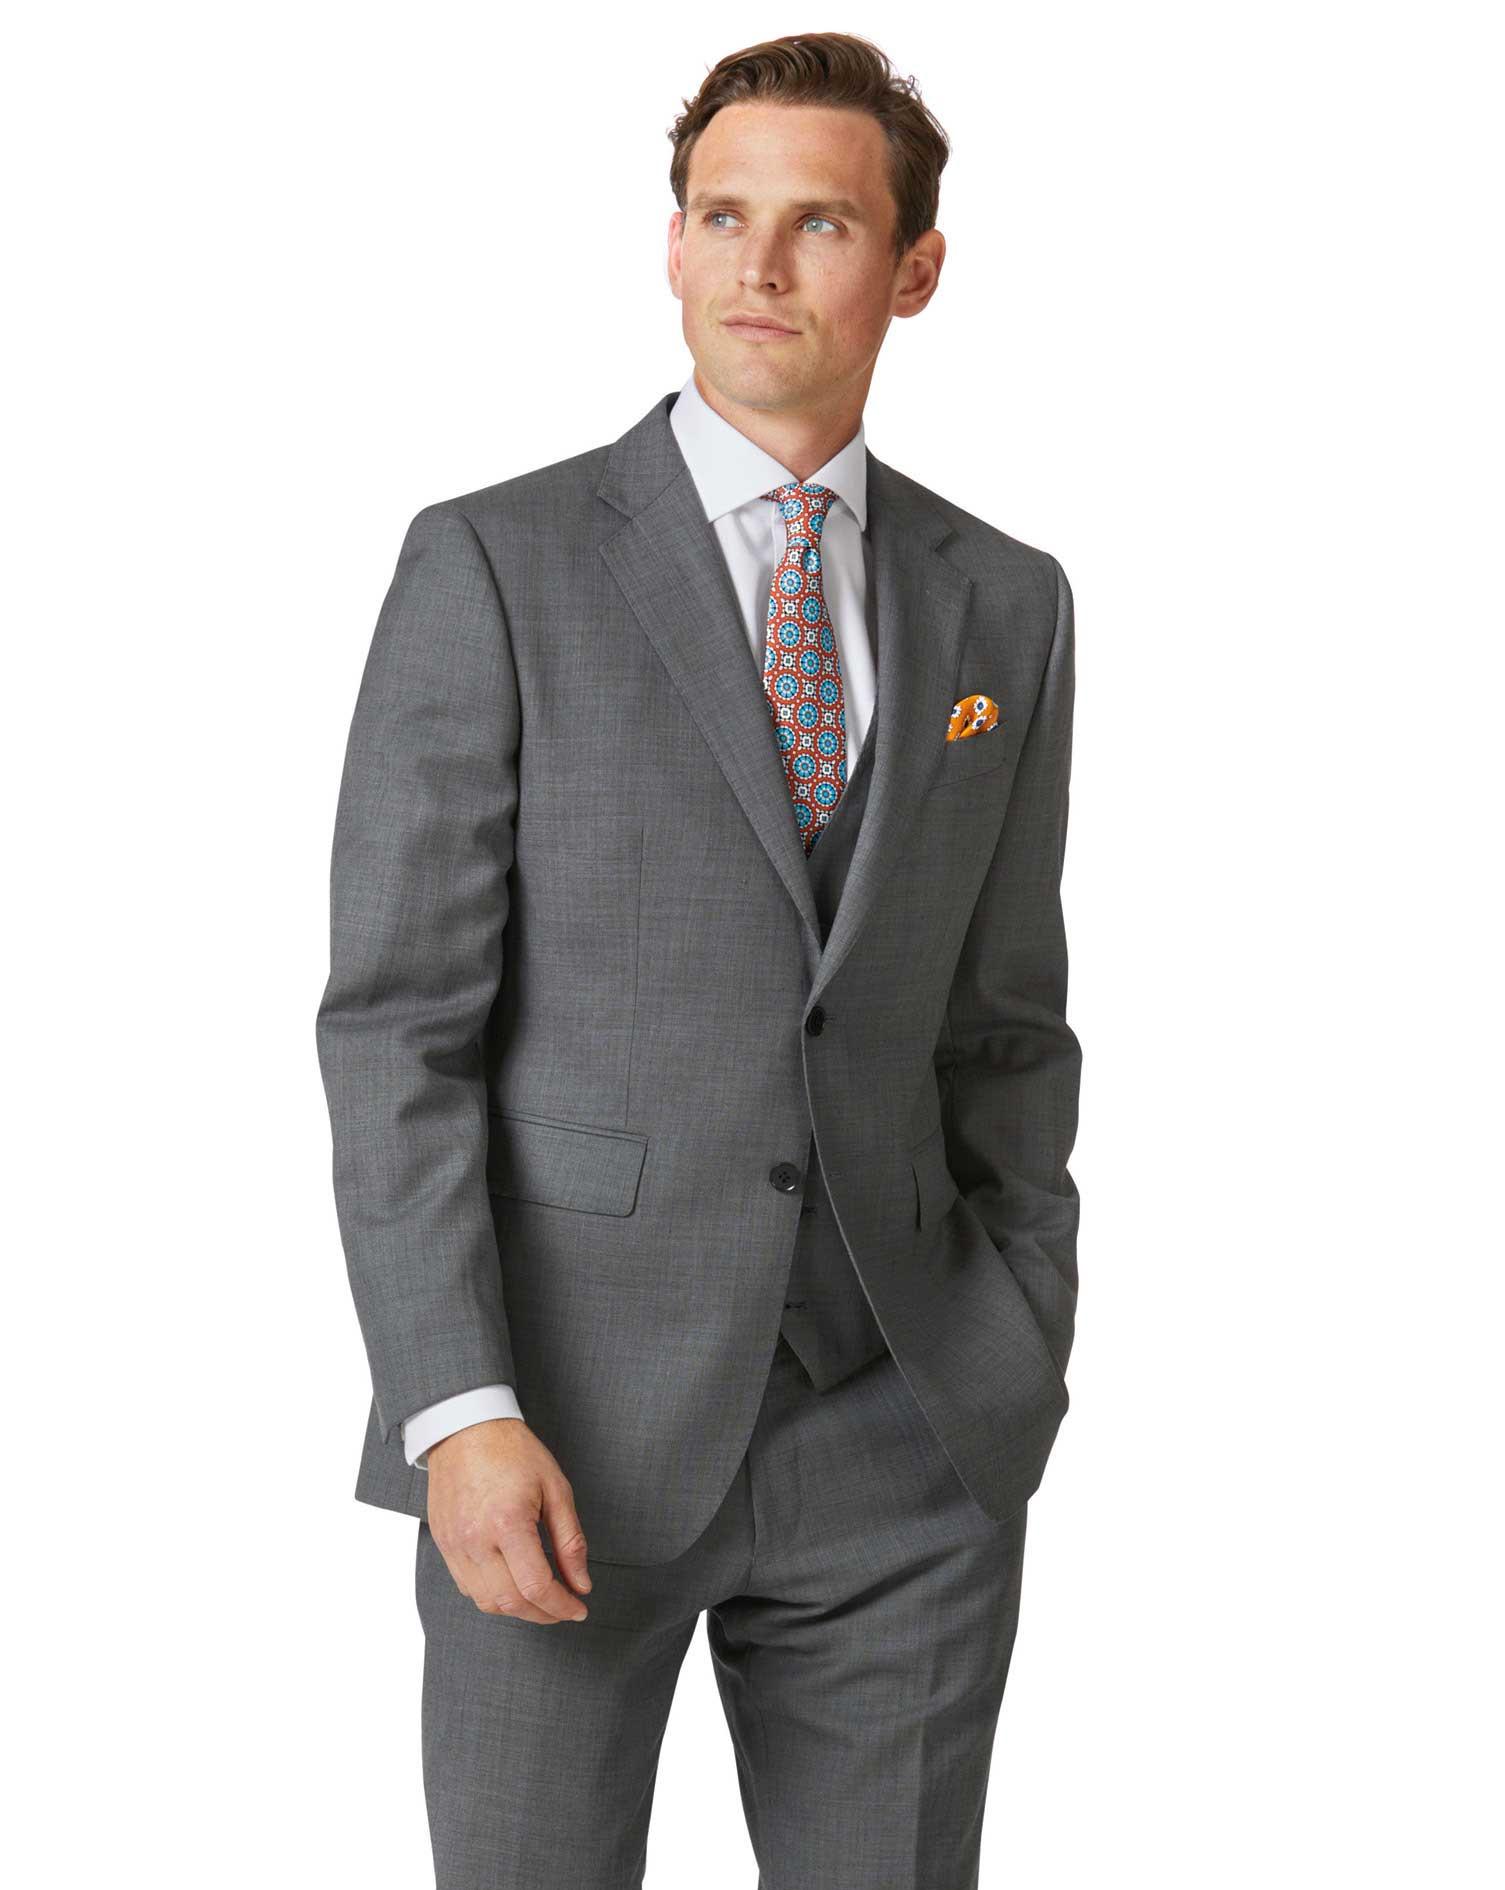 Light Grey Slim Fit Sharkskin Travel Suit Wool Jacket Size 38 Regular by Charles Tyrwhitt